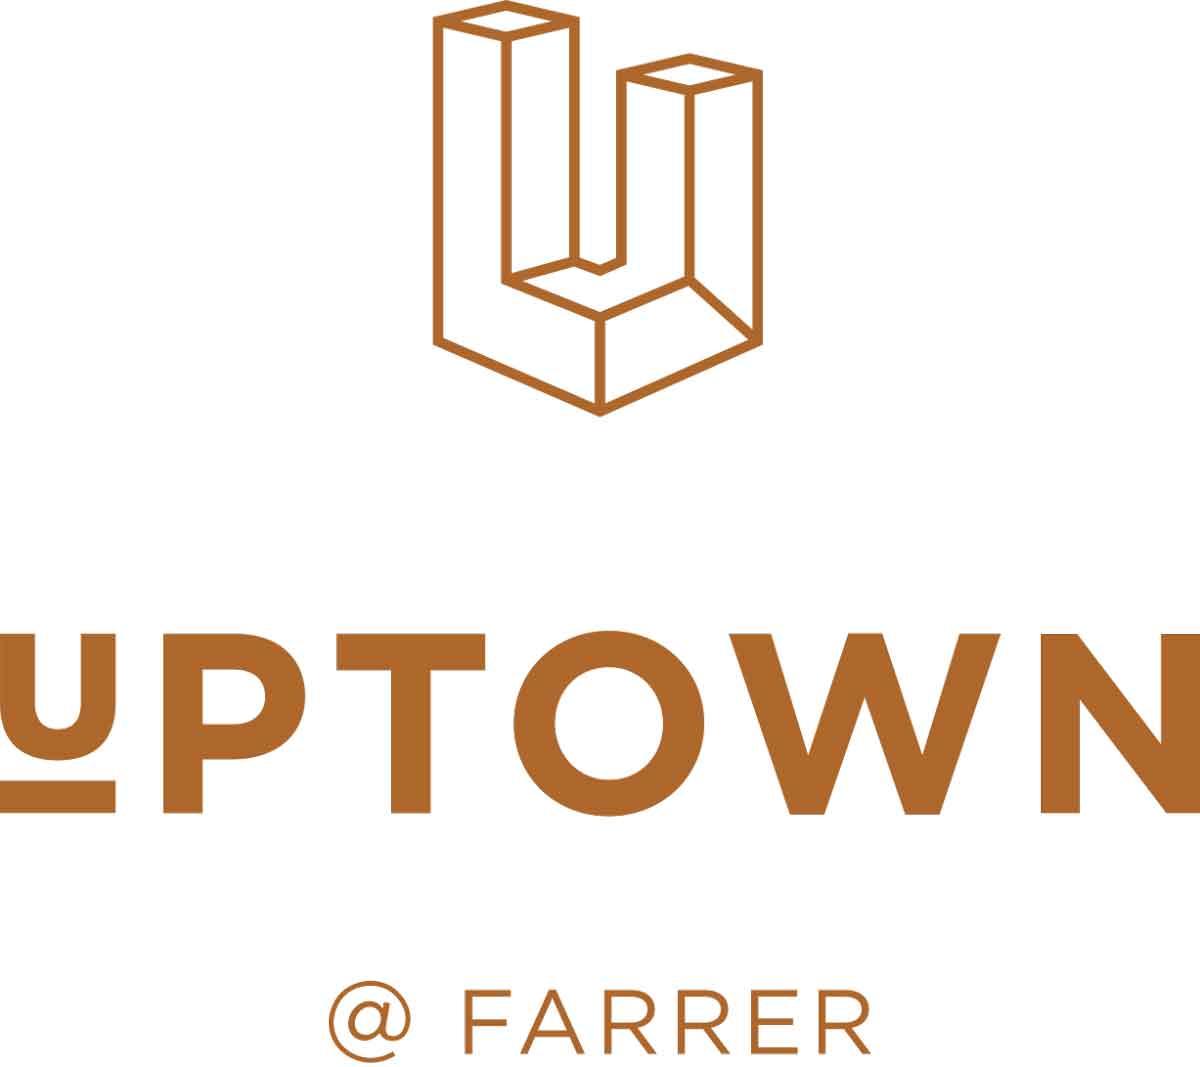 uptown-at-farrer-logo